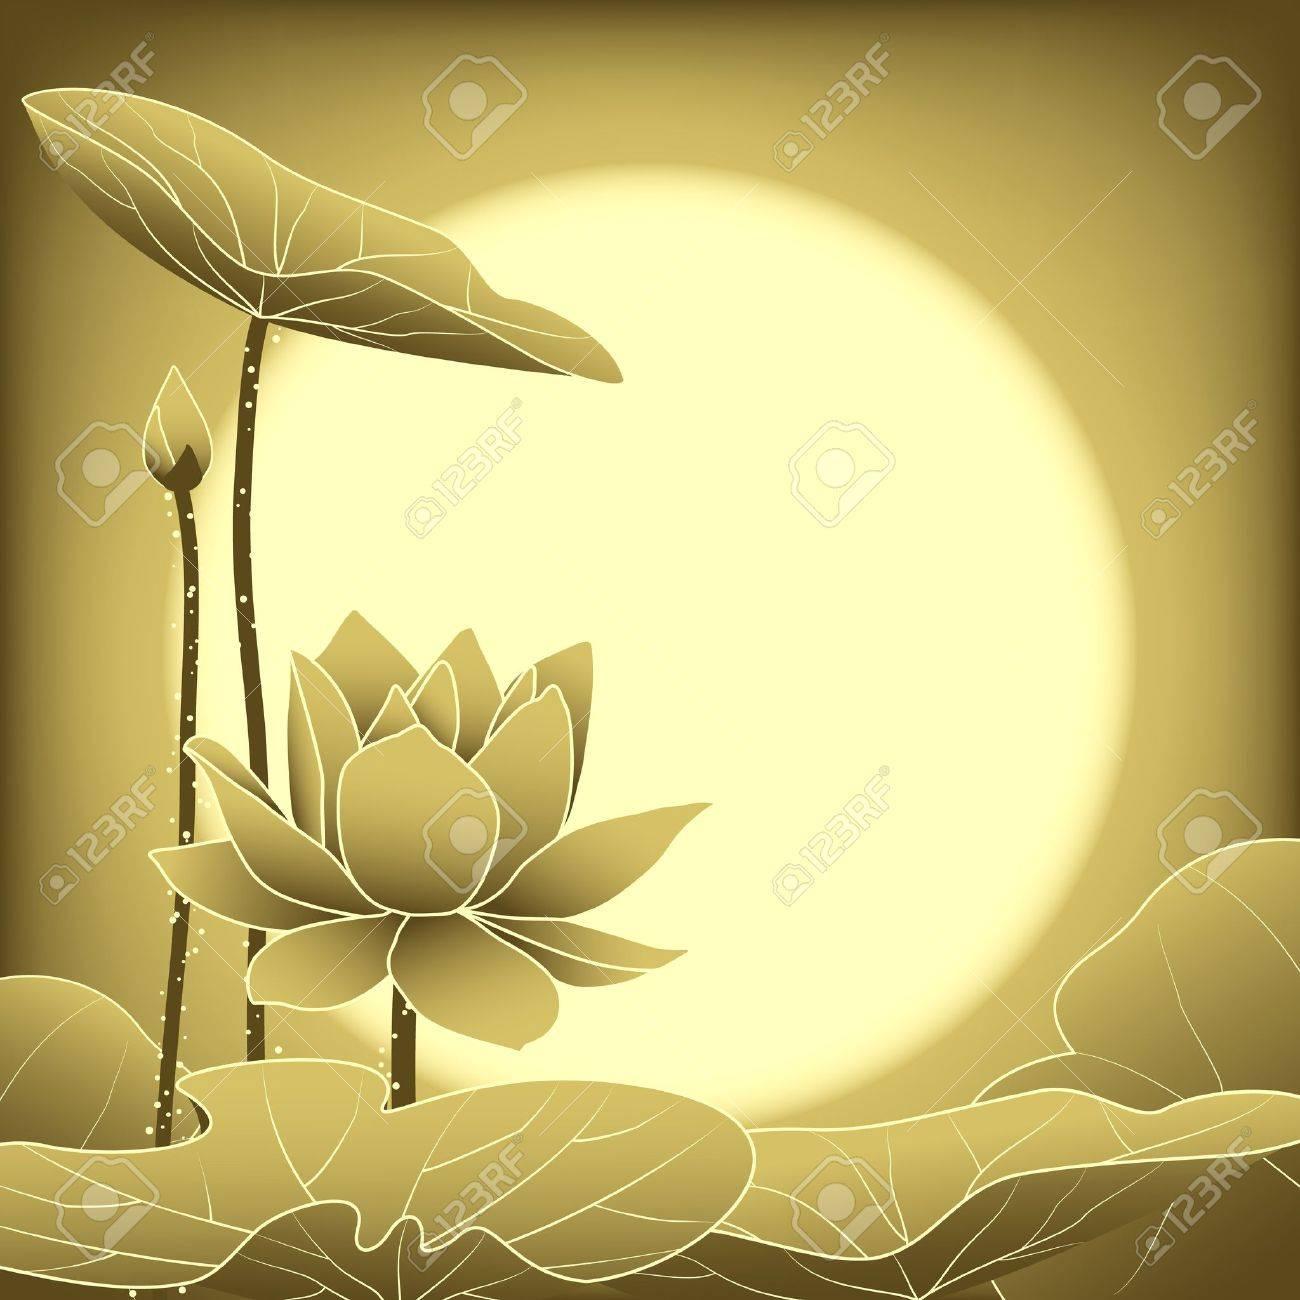 90 Black Lotus Flower Wallpaper Lotus Duck Flower Wallpaper